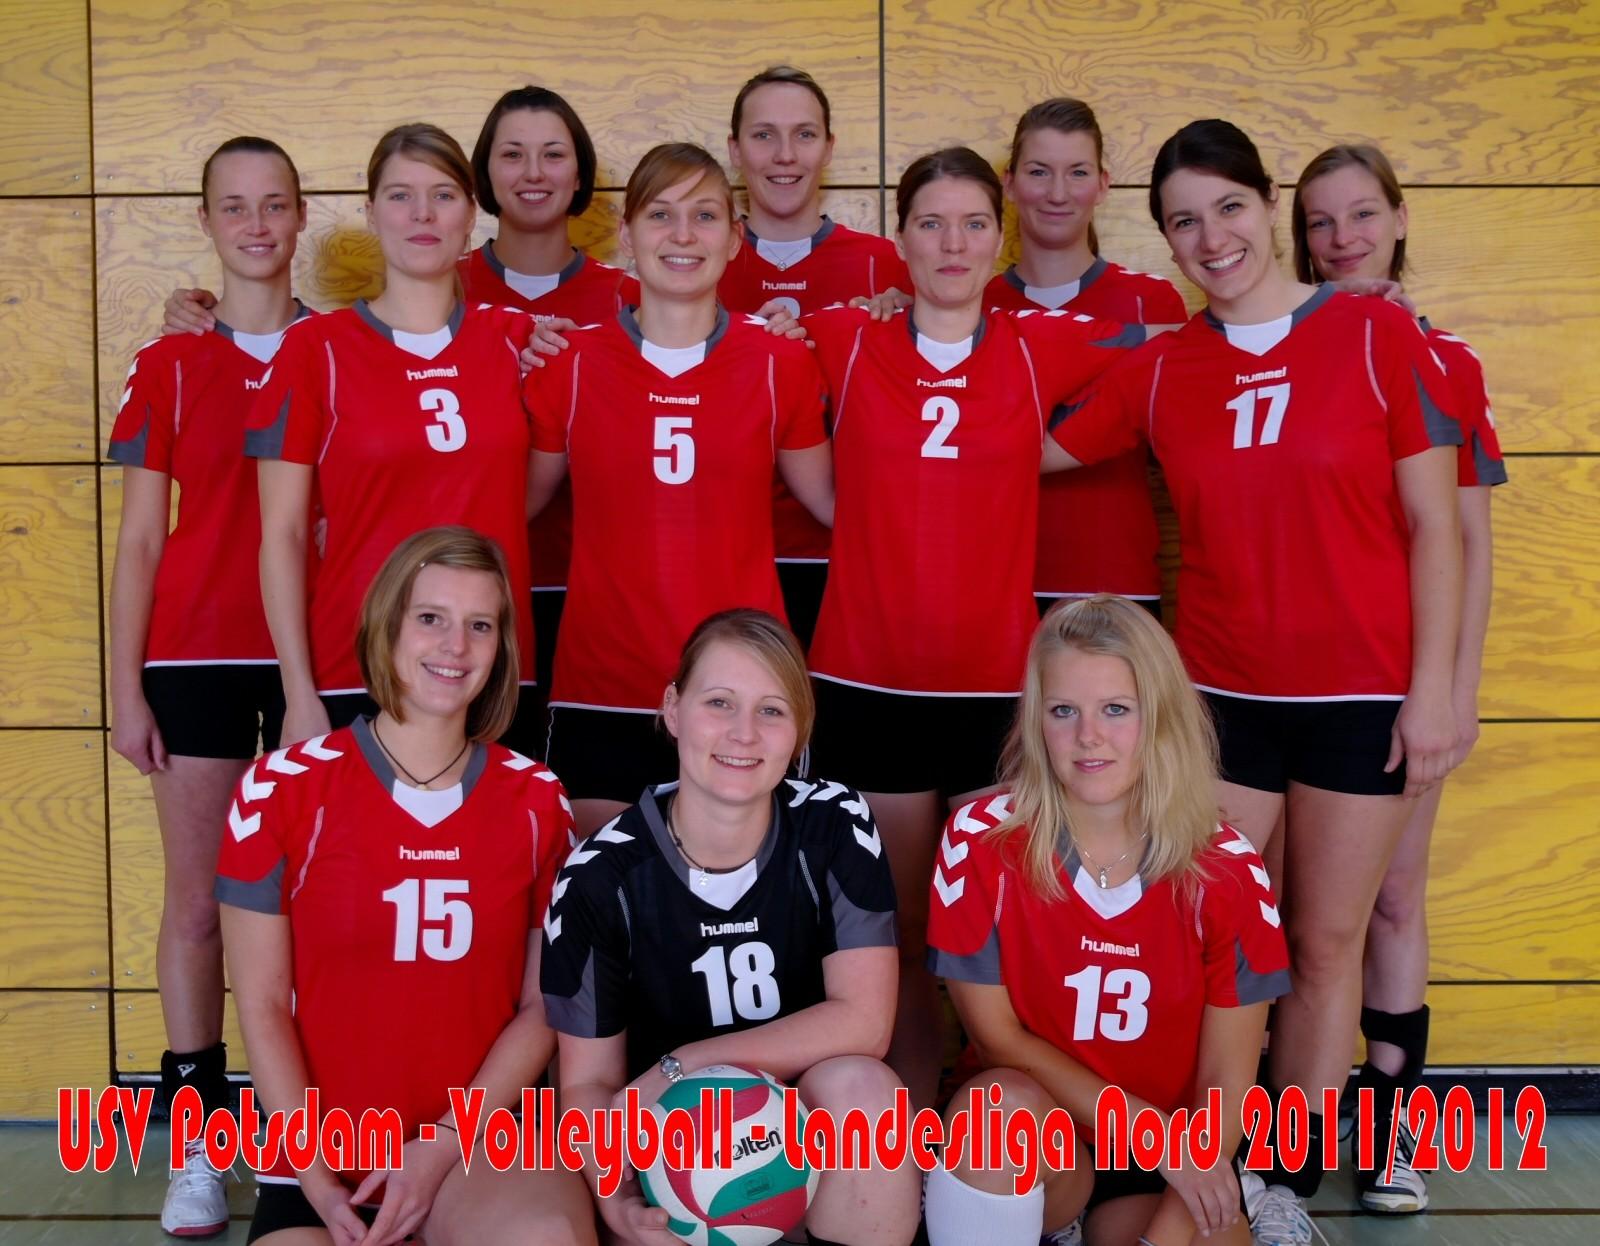 Landesliga Nord 2011/2012